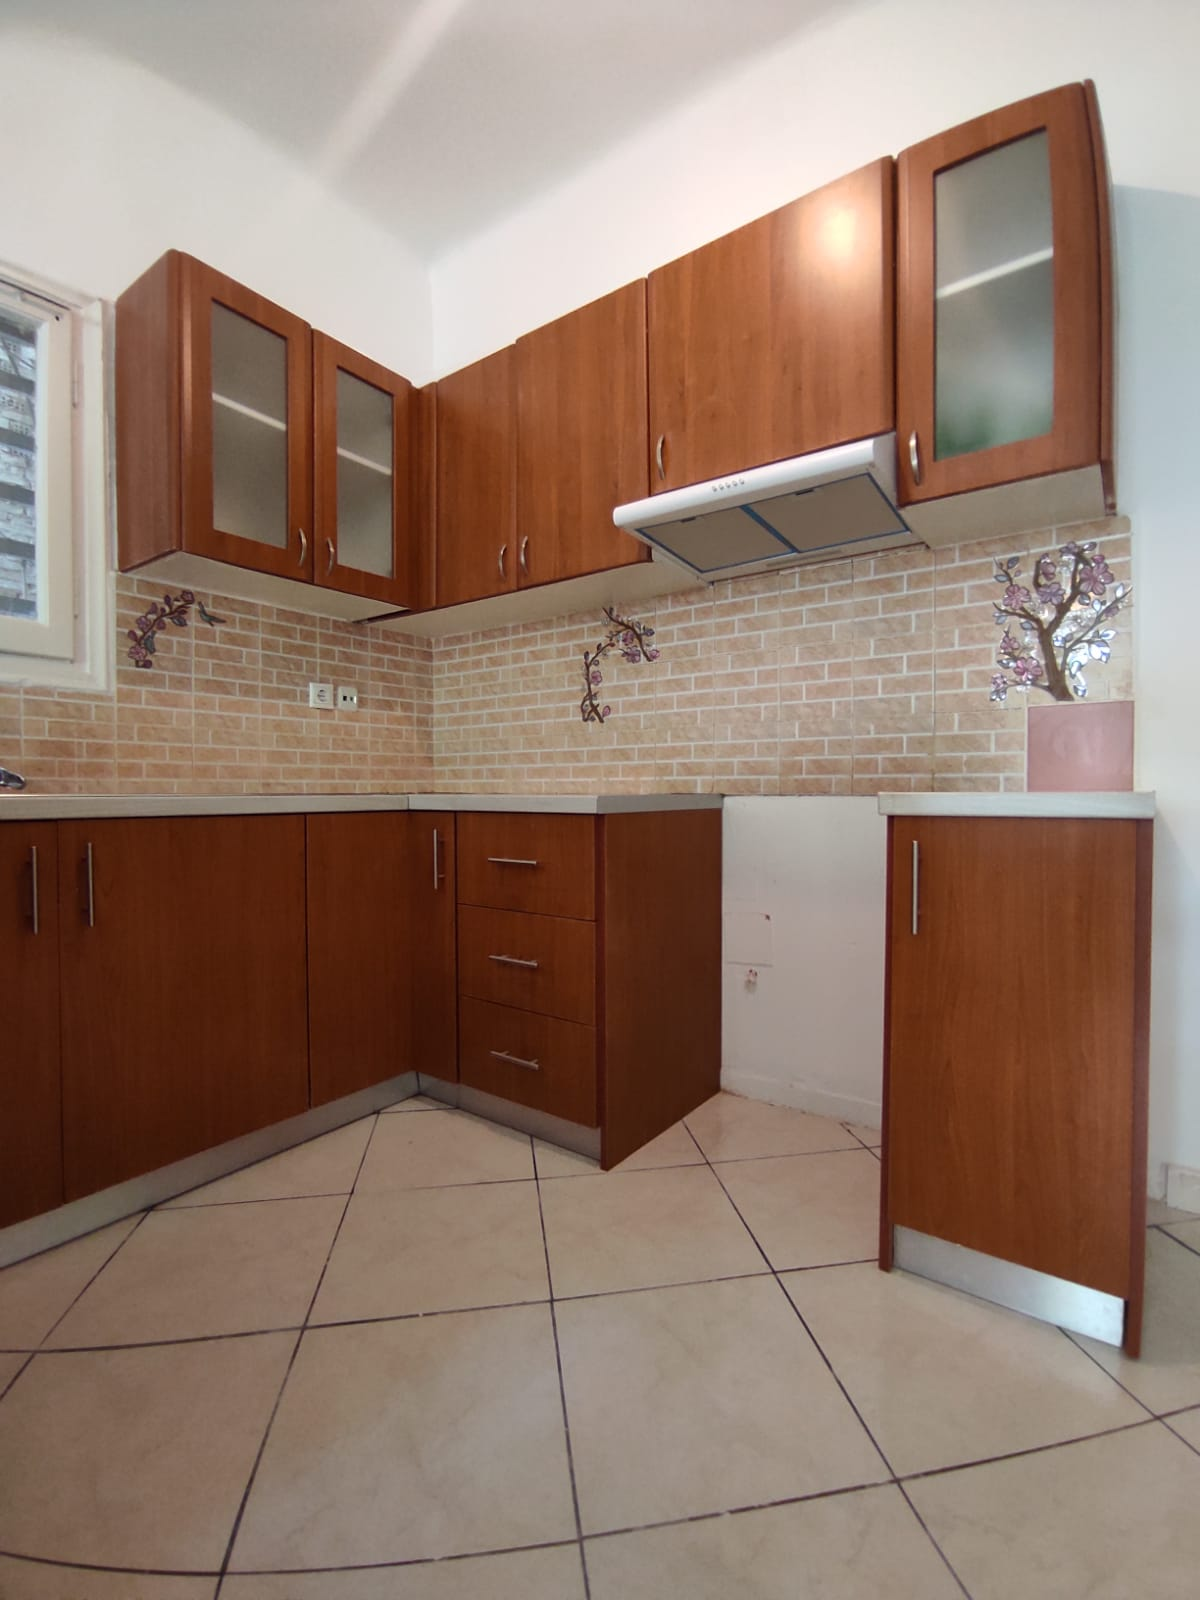 Apartment for Sale in Athens – Attiki Center, Platia Attikis FC2024